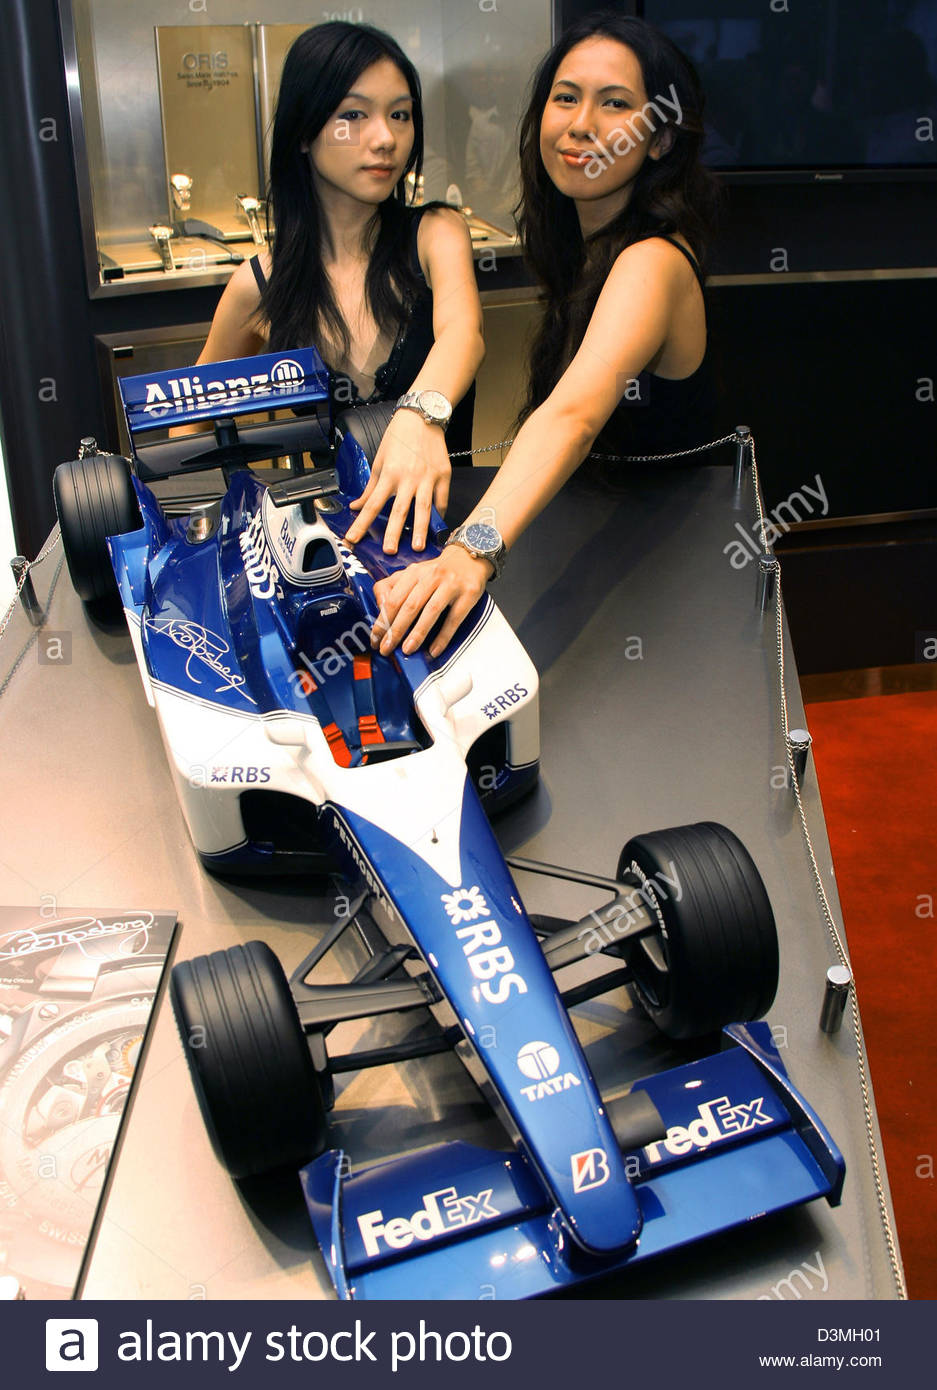 Dino reccomend Asian models 2006